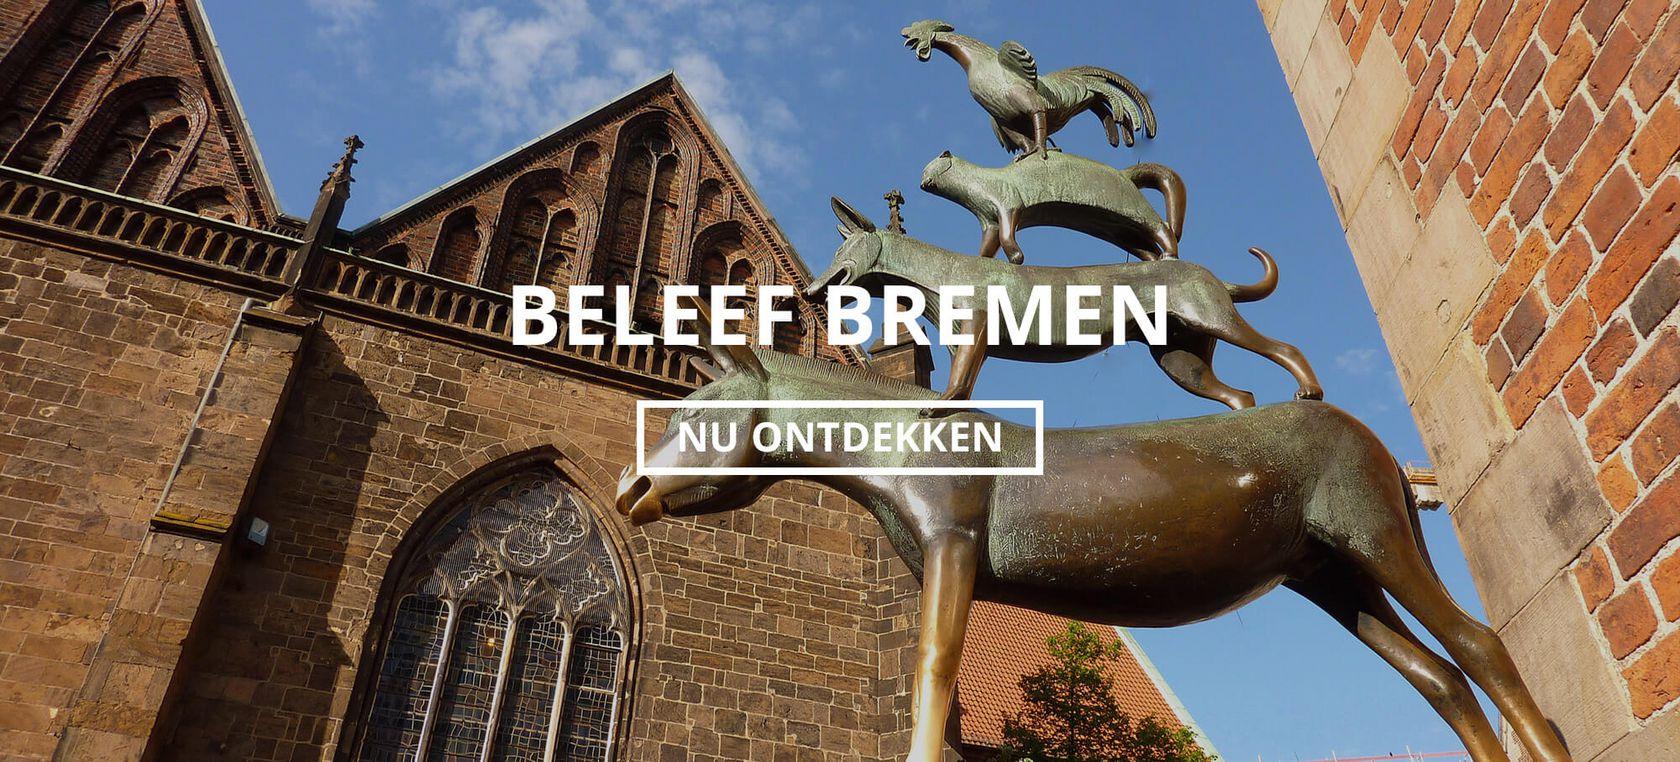 Bremerstadtmusikanten